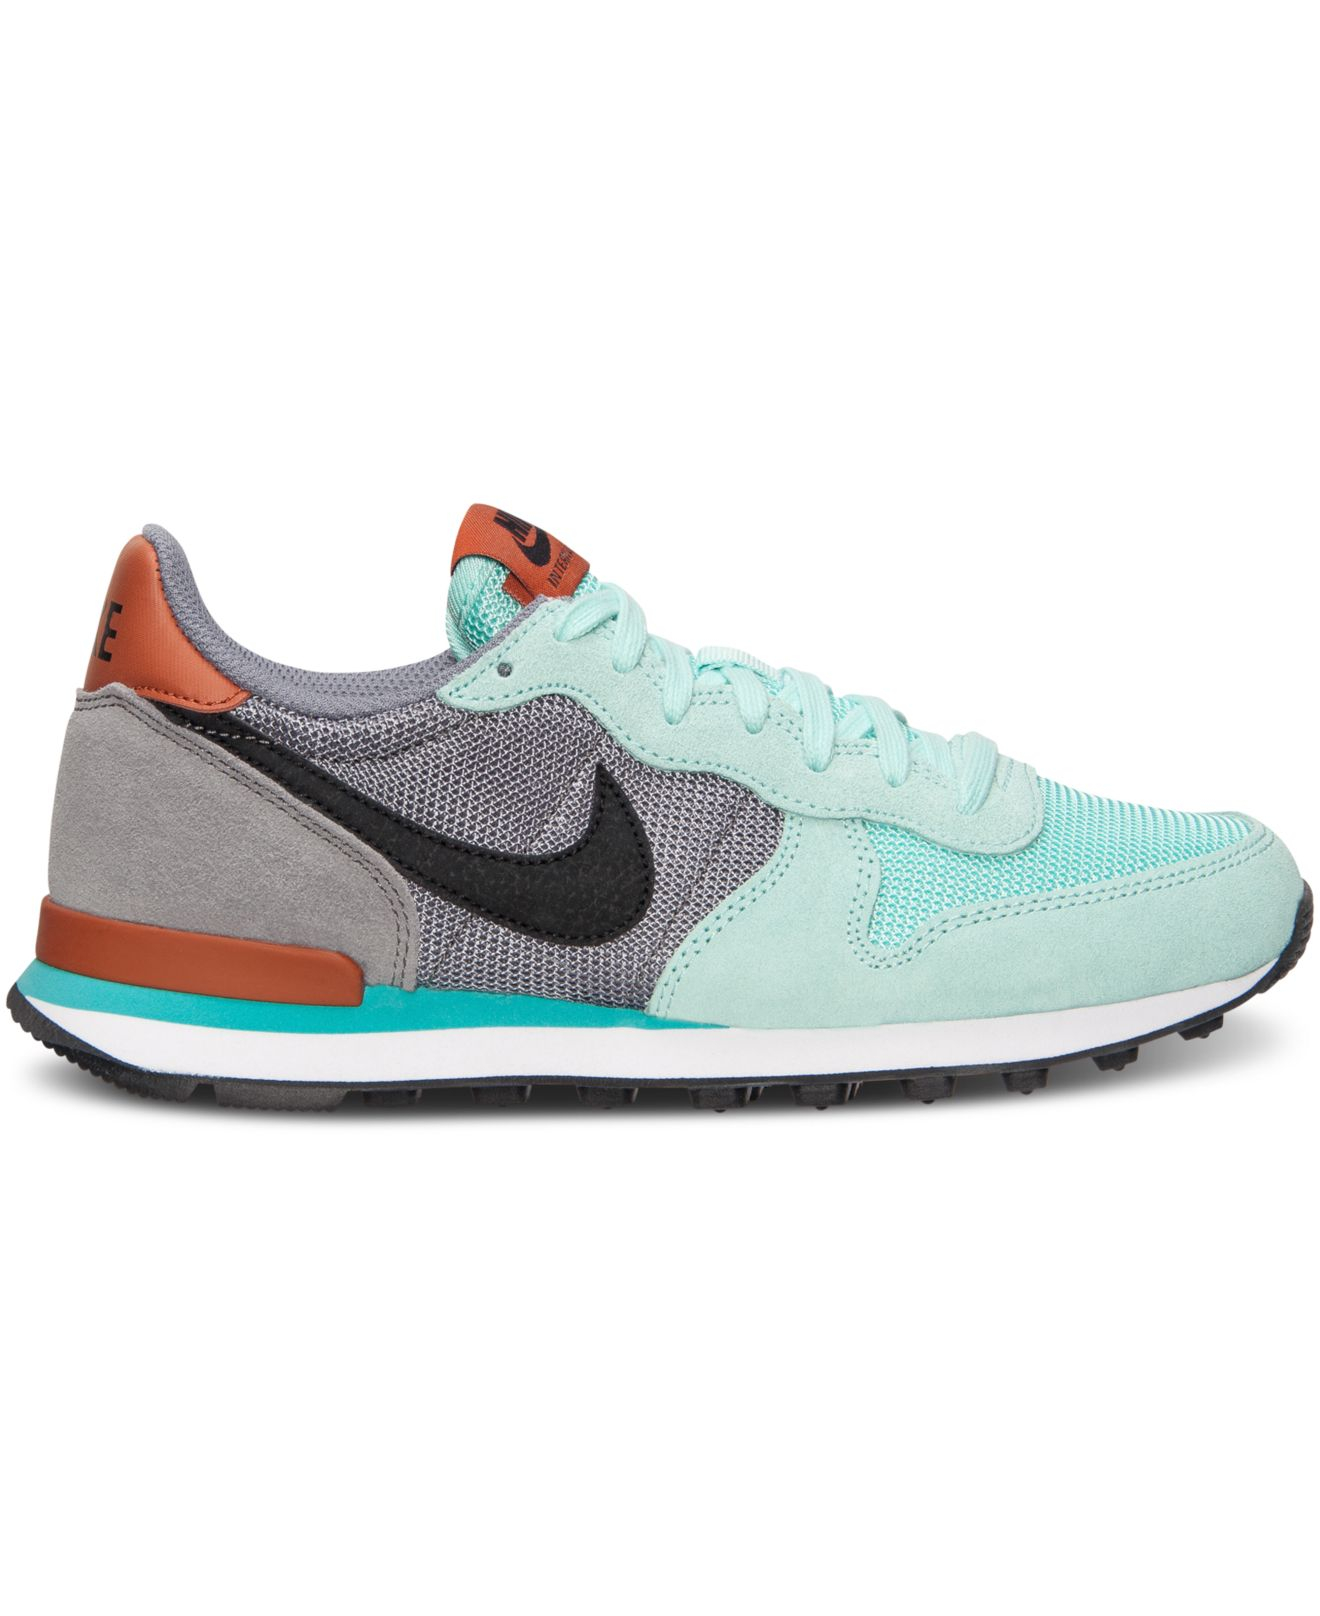 Nike Women's Internationalist Casual Sneakers From Finish ...